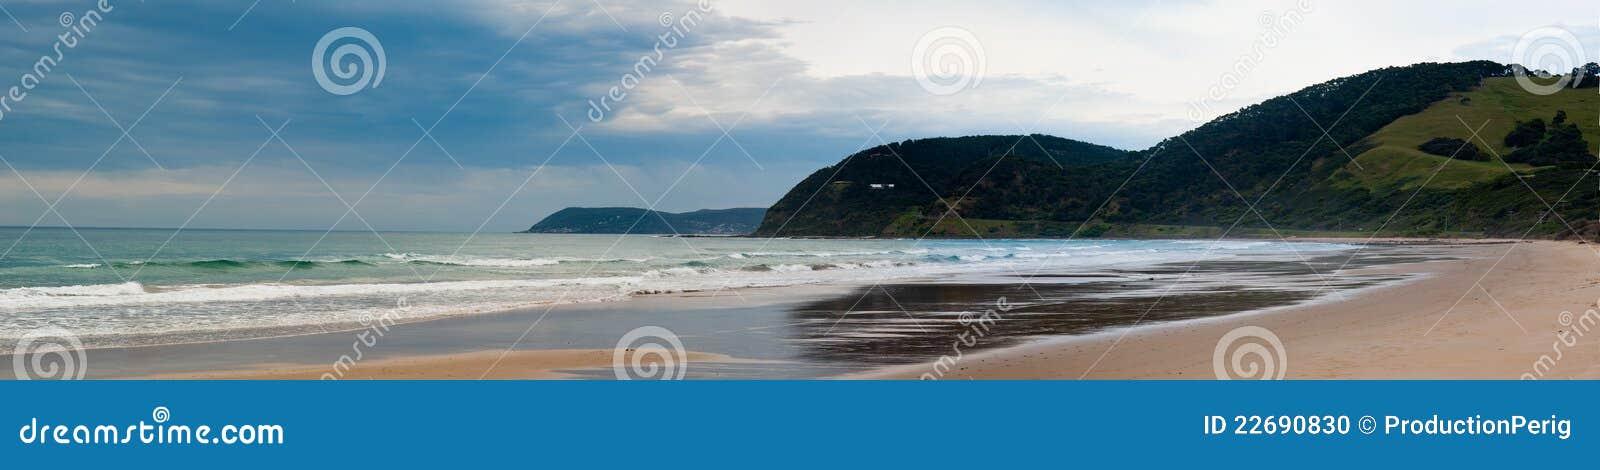 Playa de Torquay - Australia